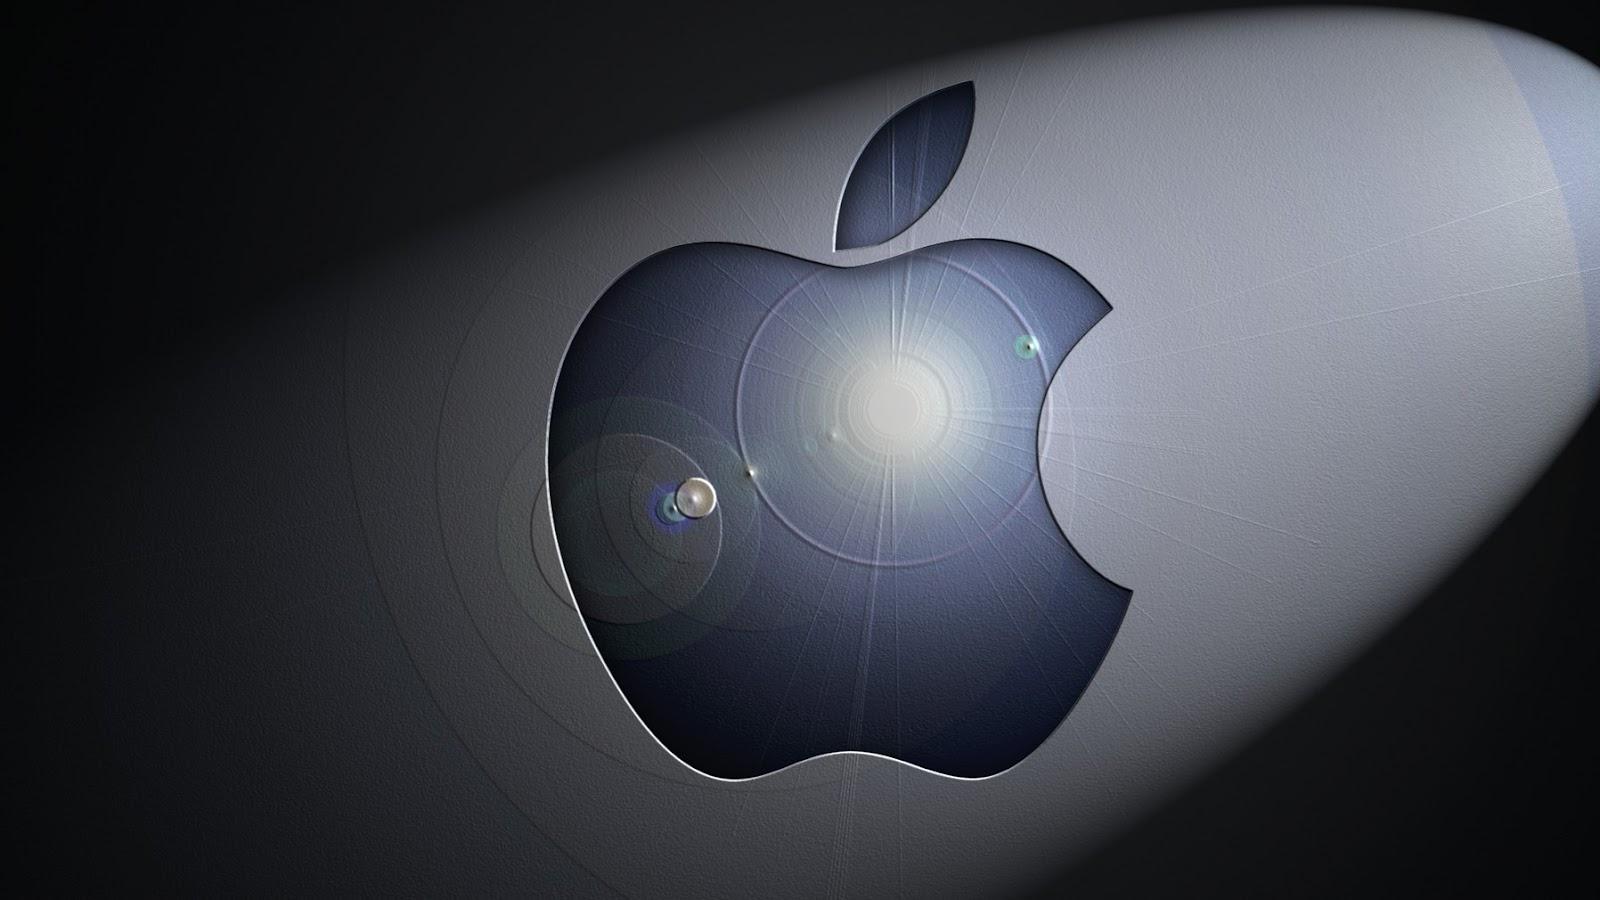 Apple Mac Wallpapers HD Nice Wallpapers 1600x900